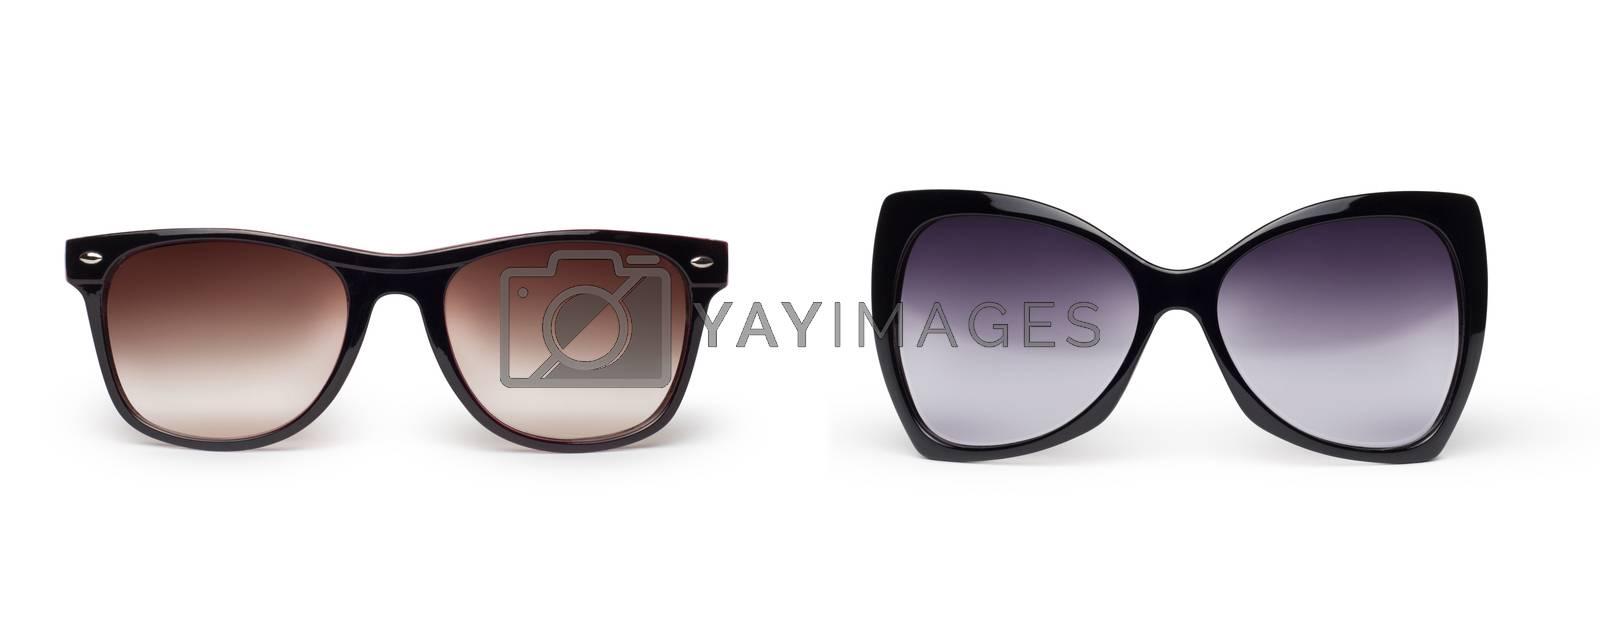 Fashion Sun glasses isolated on white